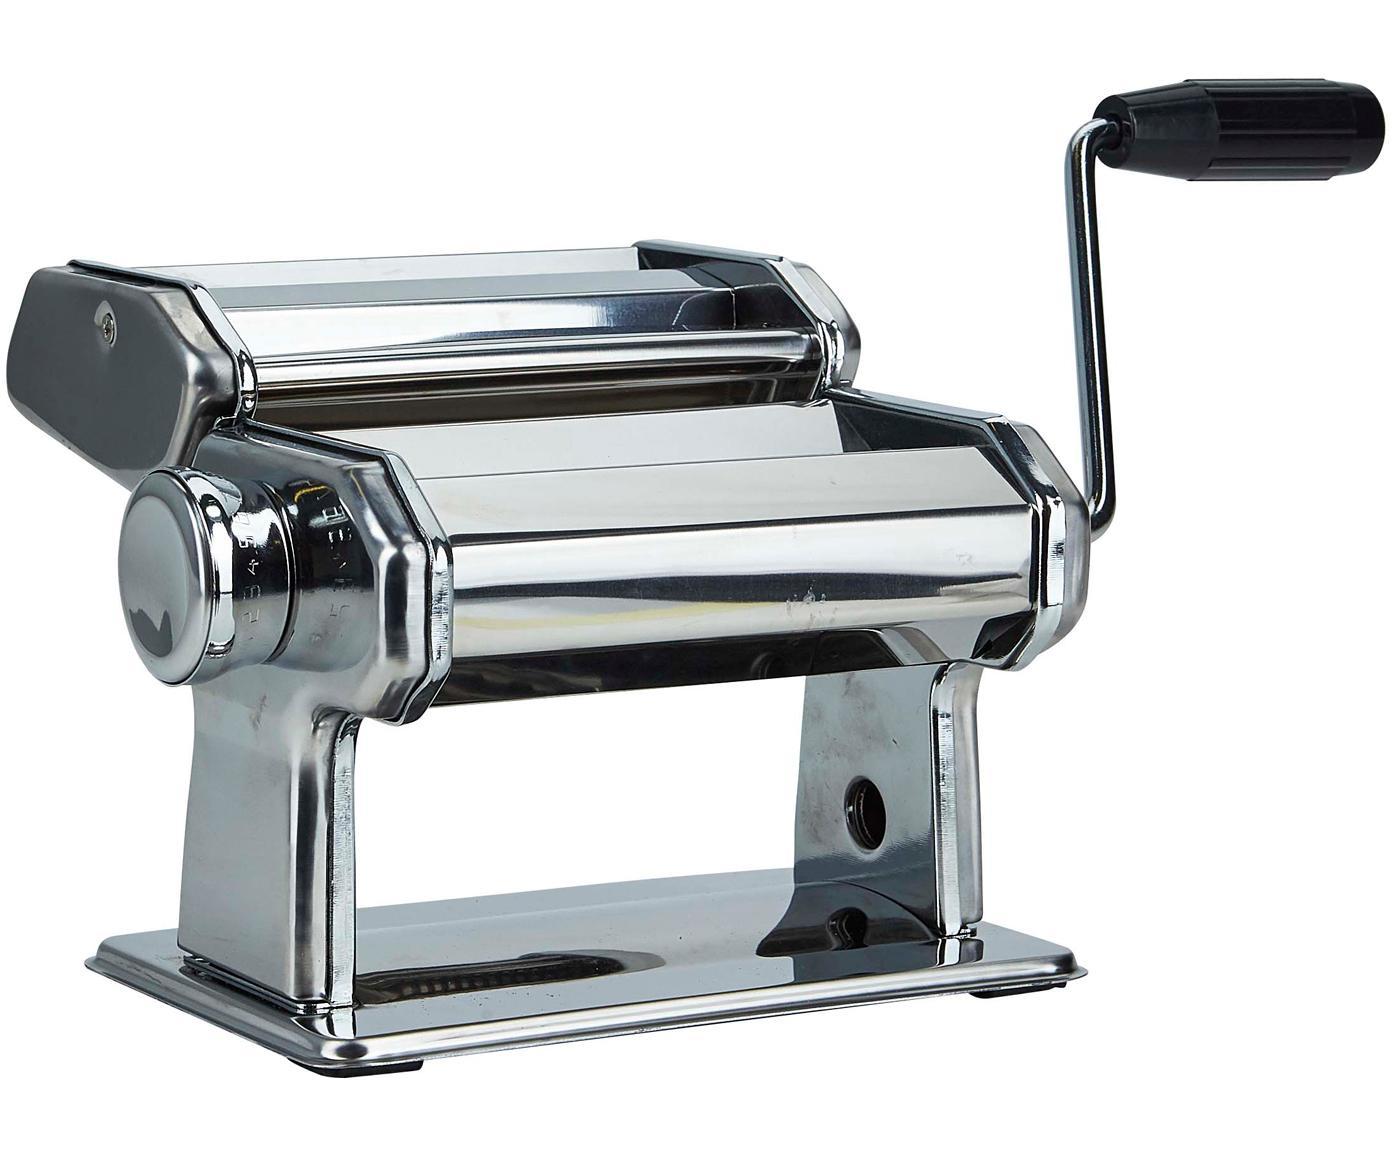 Nudelmaschine Giuseppe, Rostfreier Stahl, Kunststoff, Stahl, 21 x 15 cm